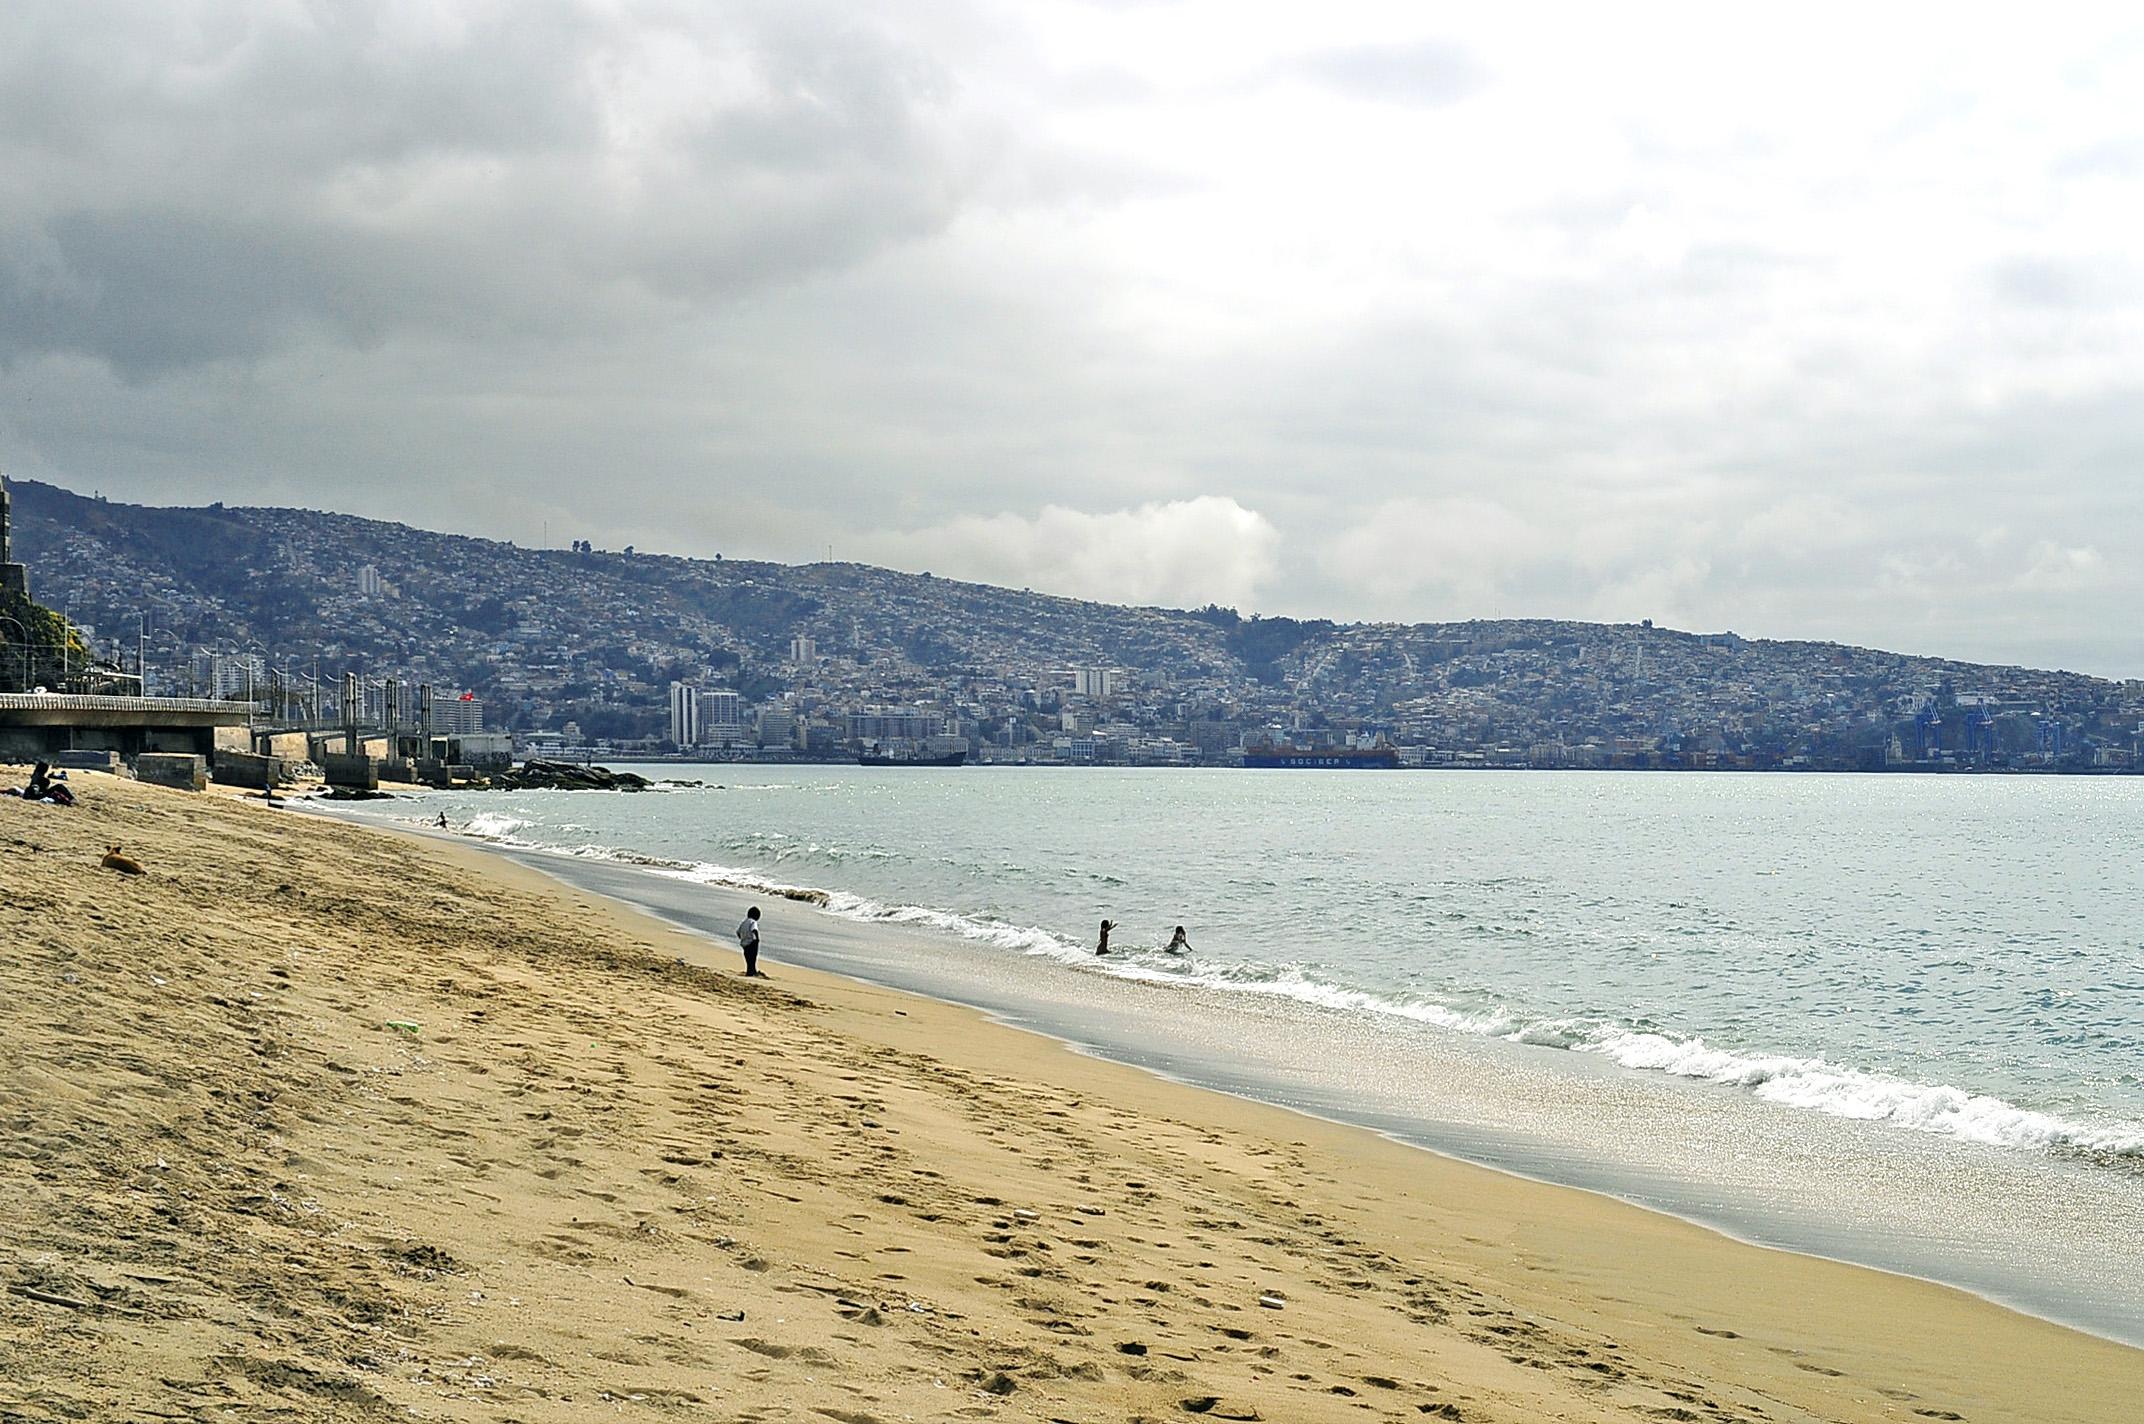 Playa Caleta Portales, importante praia de Valparaíso